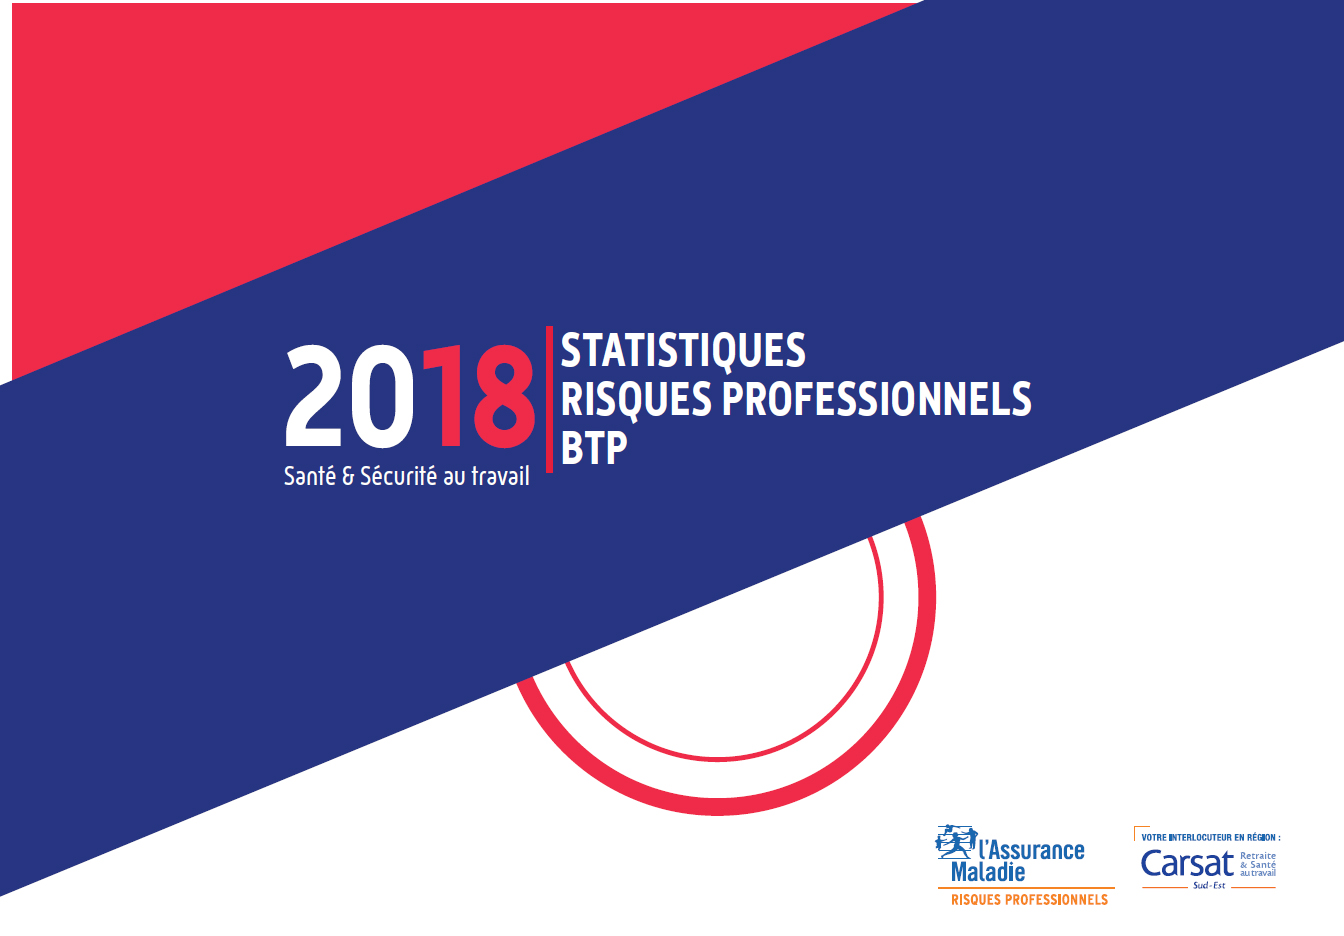 statistiques paca corse btp 2018